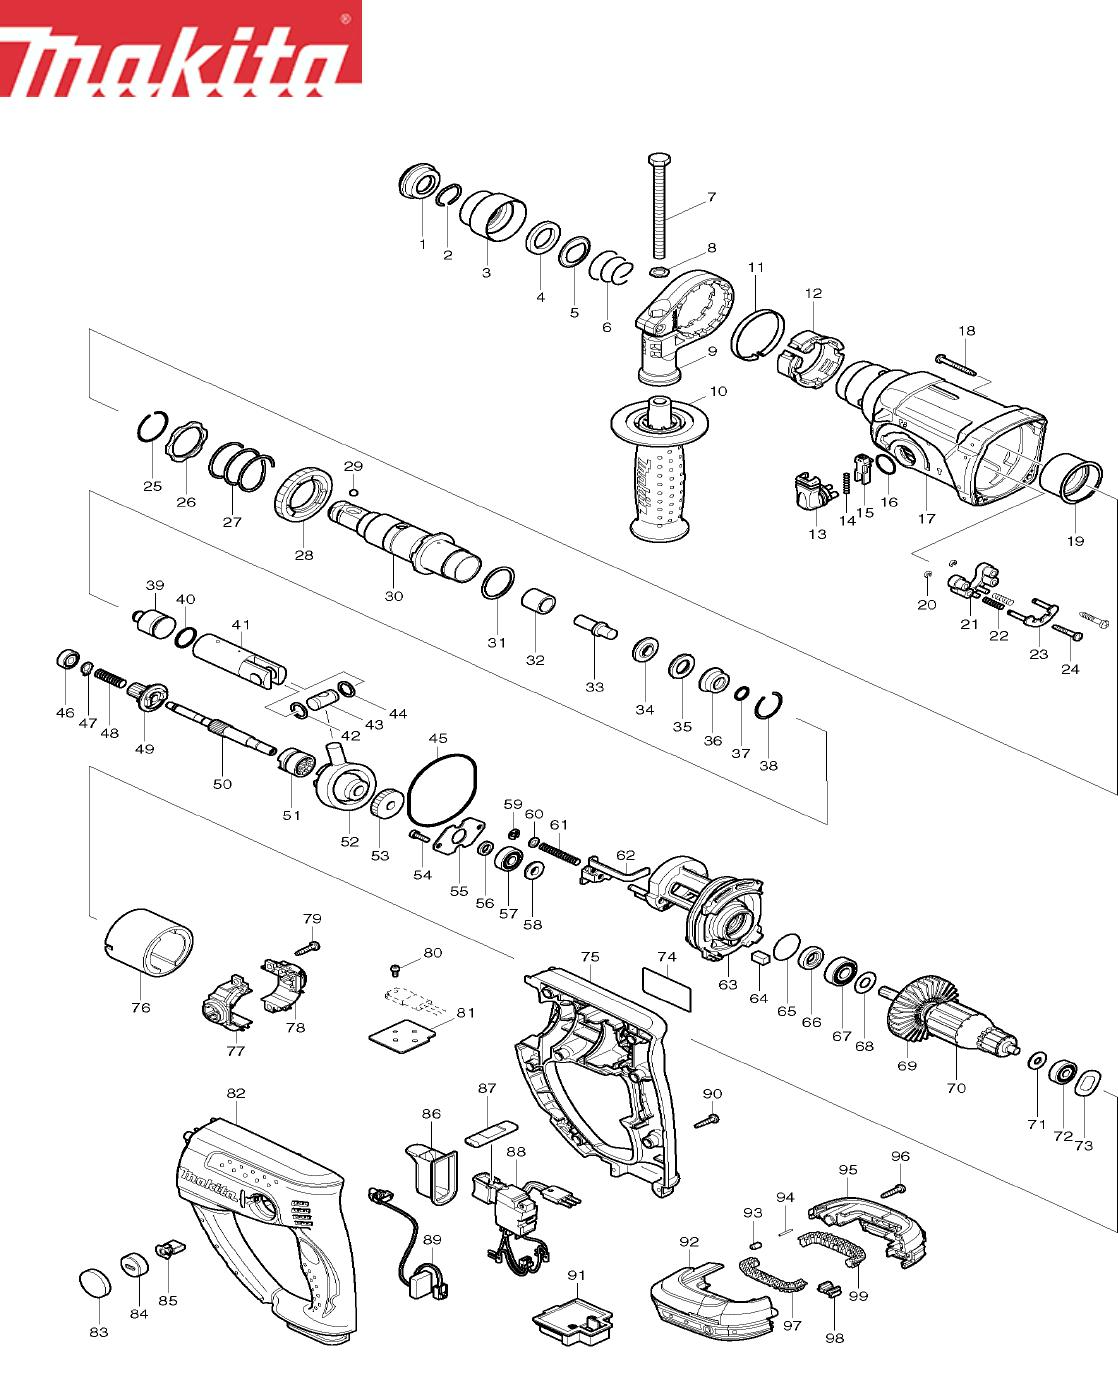 Makita Bhr202 Users Manual on